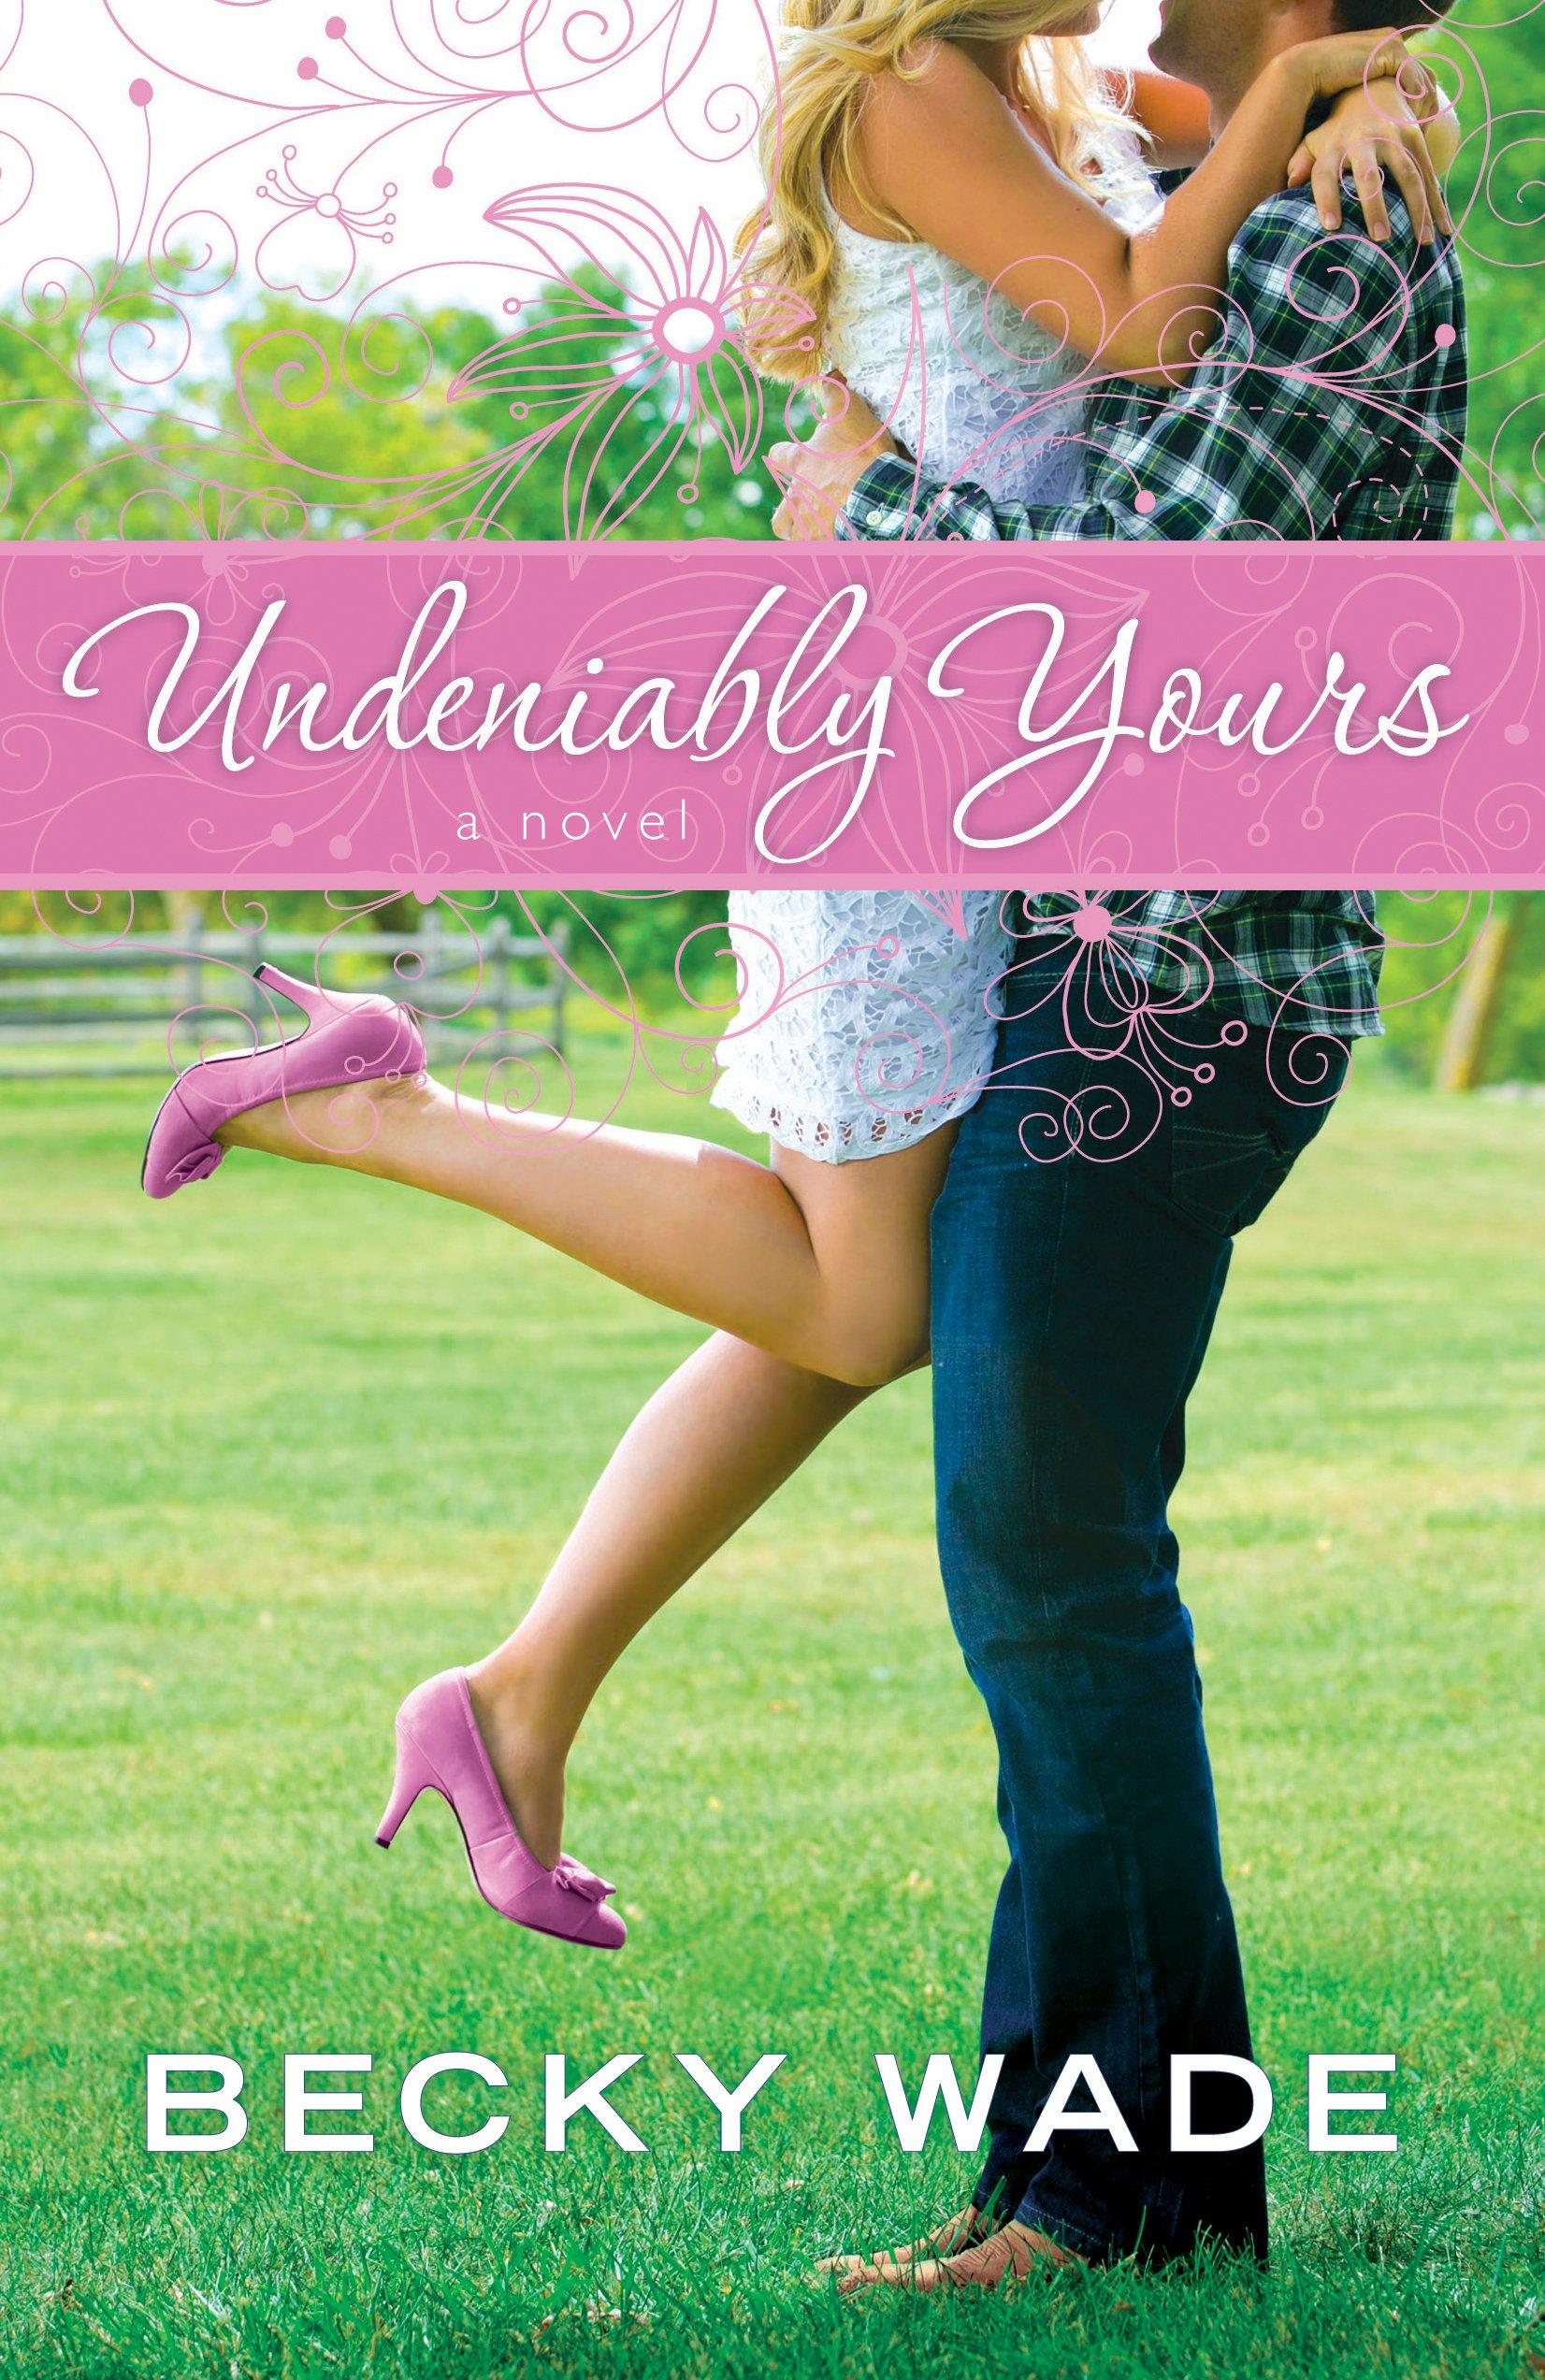 Undeniably Yours (Thorndike Press Large Print Christian Romance) pdf epub